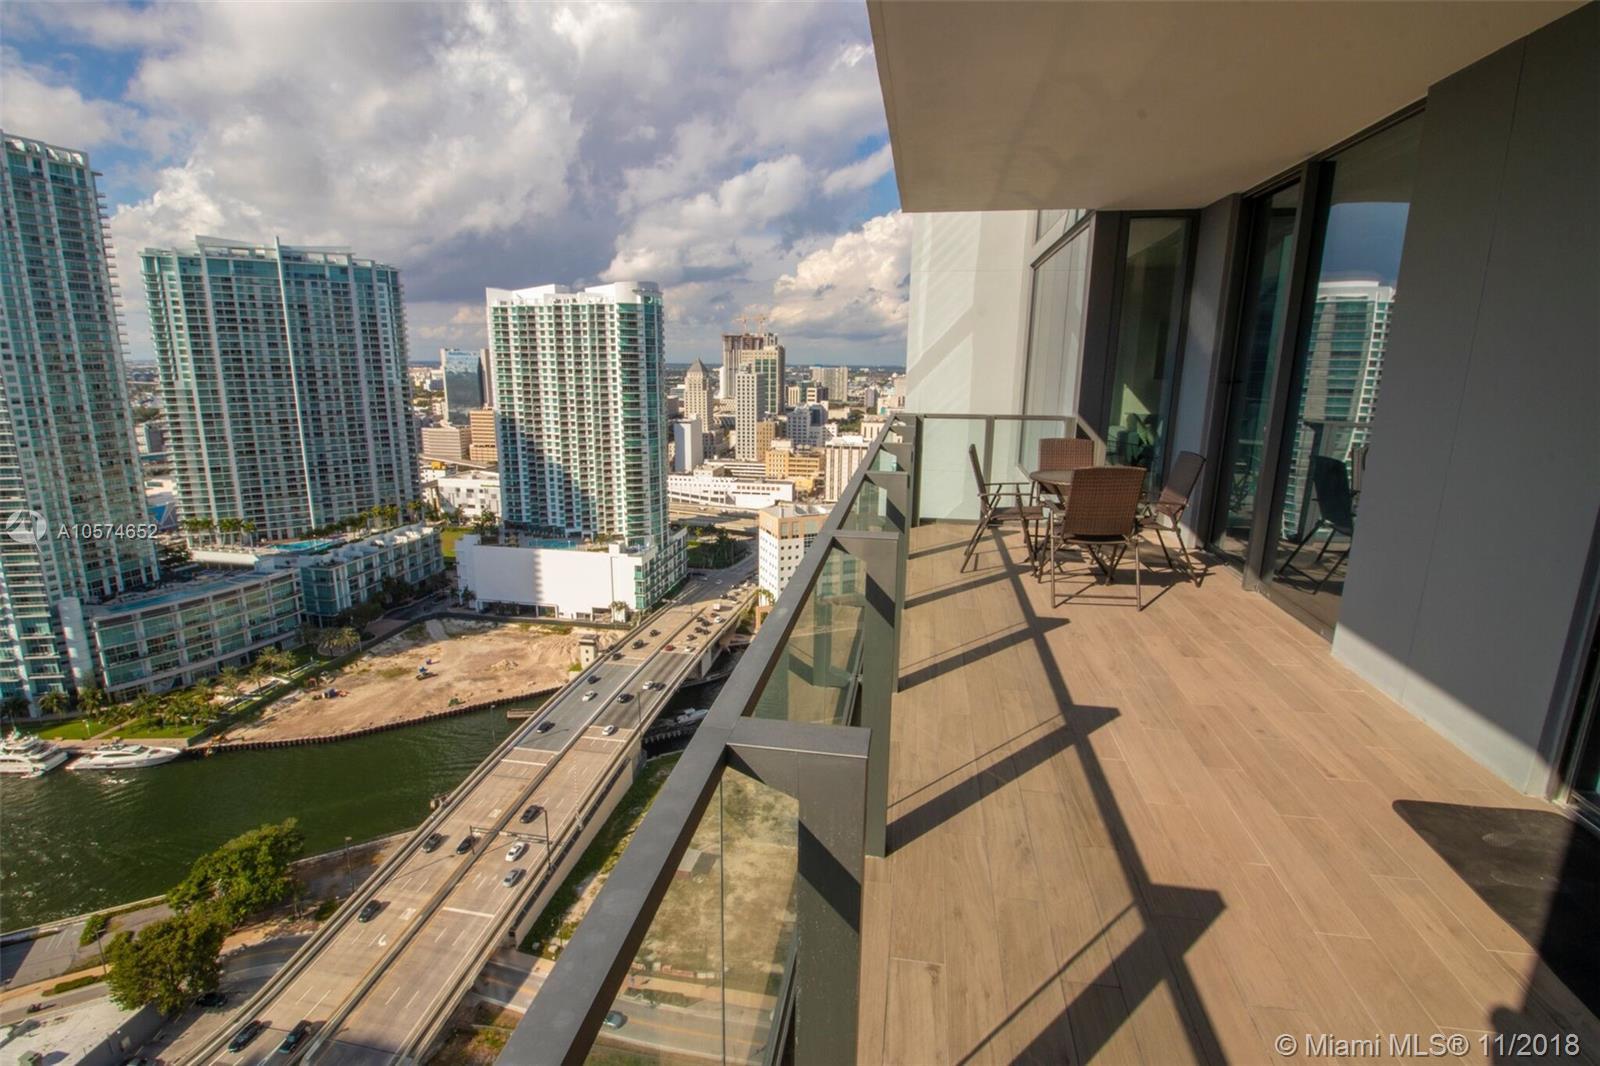 Photo - 68 SE 6th St # 2810, Miami FL 33131